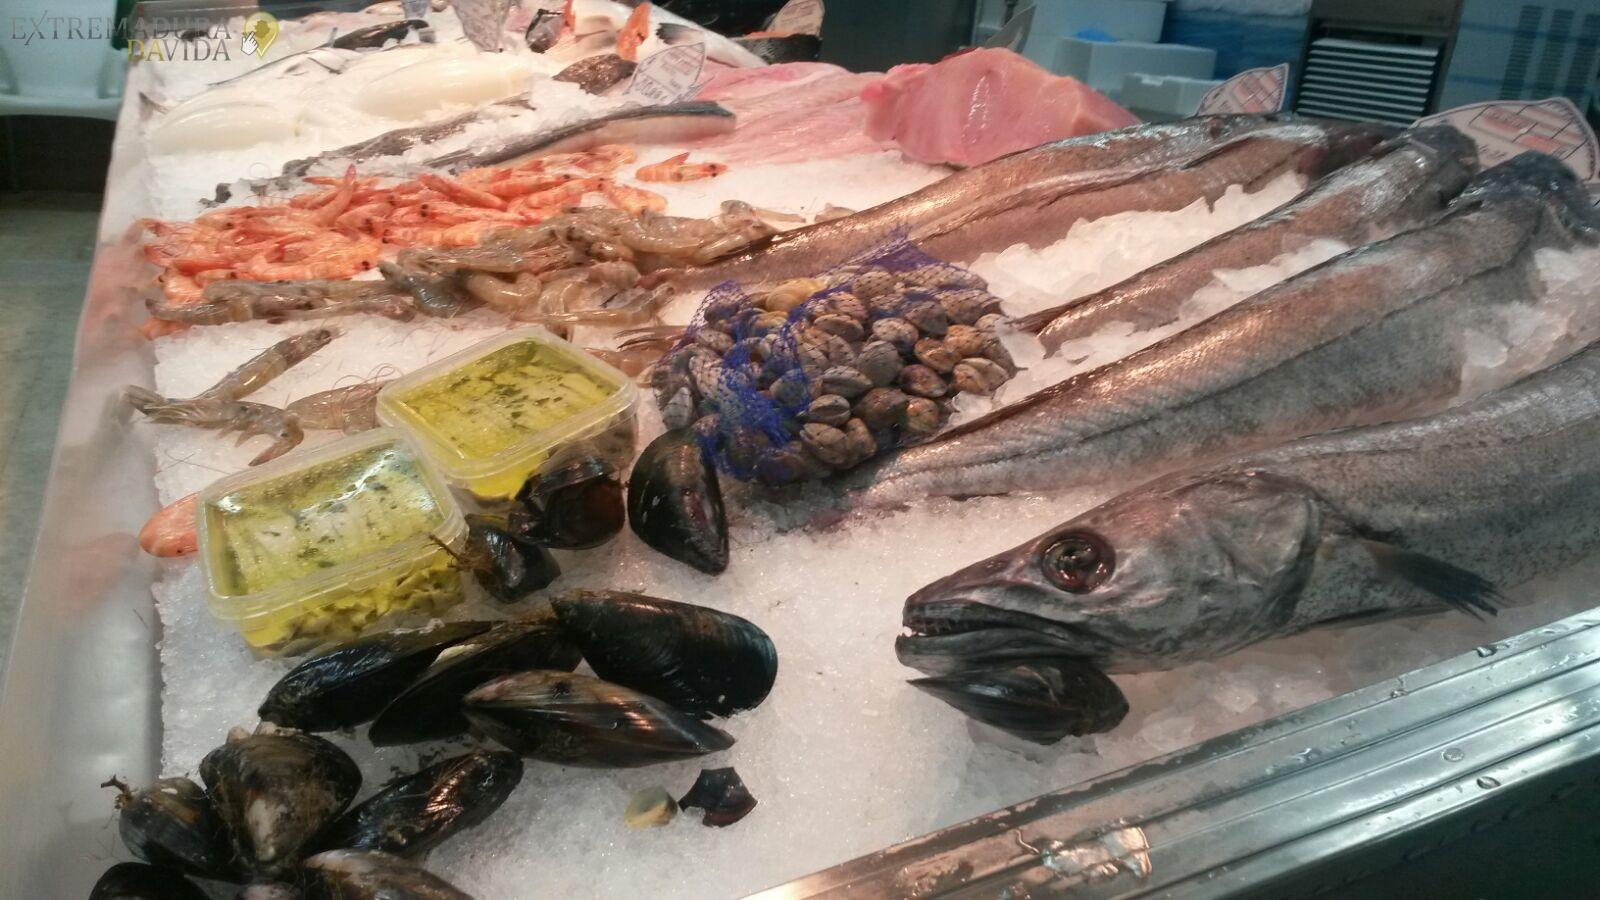 Supermercados Extremadura Cáceres Low Cost